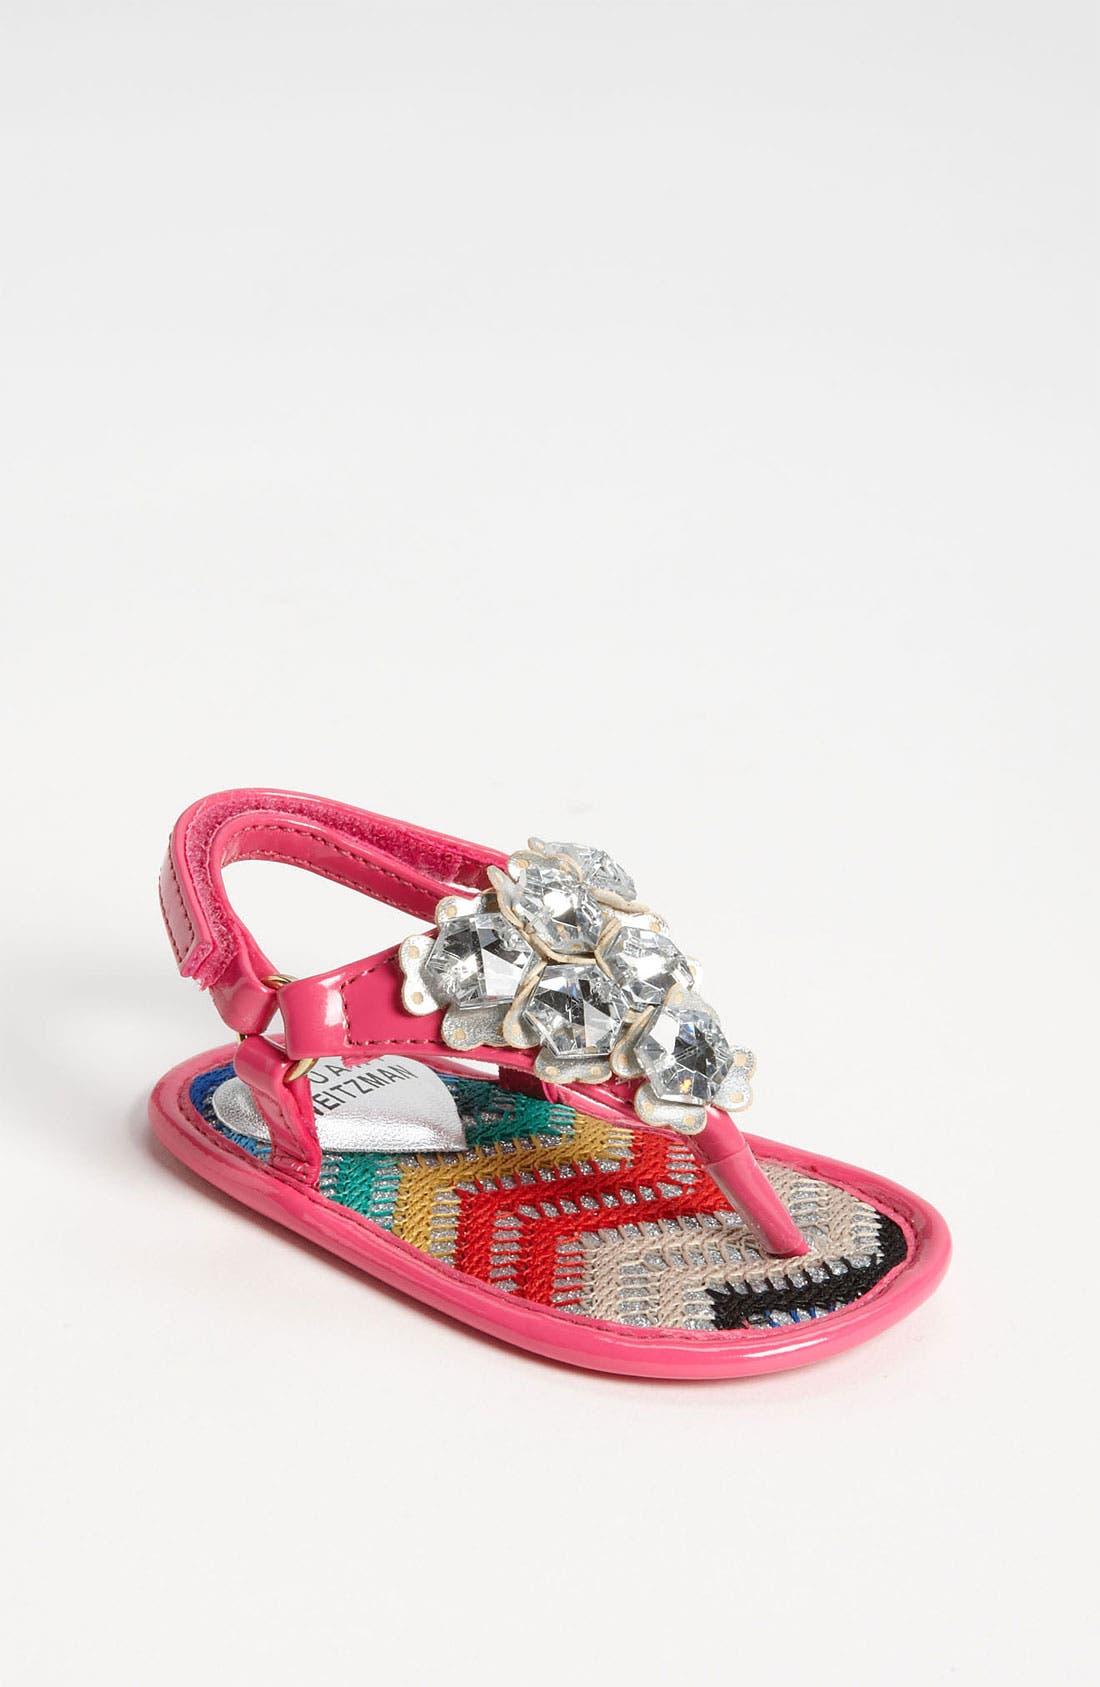 Main Image - Stuart Weitzman 'Baby Peridot' Sandal (Baby)